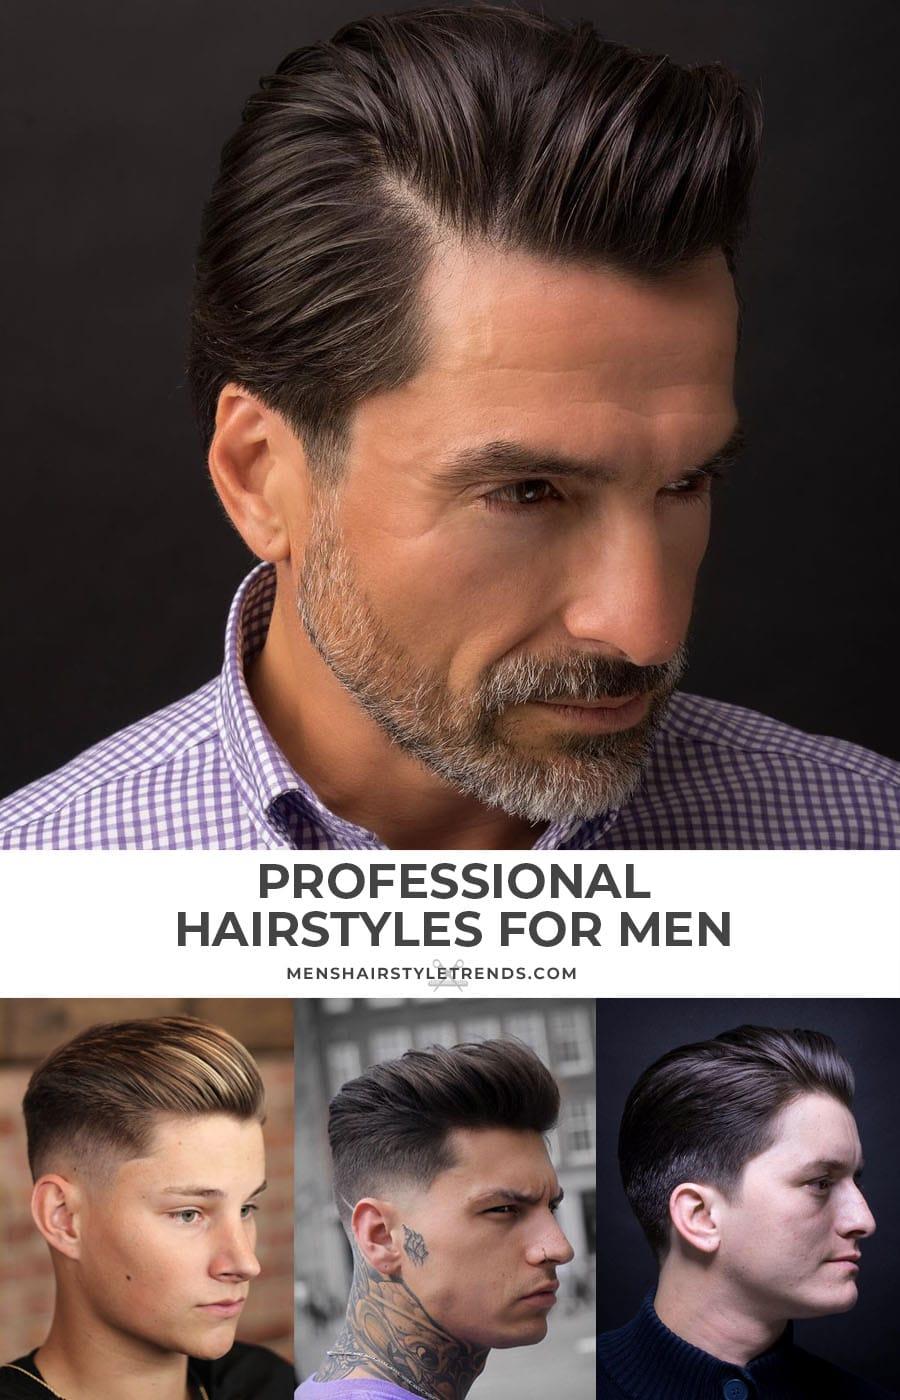 Professional Hairstyles For Men - Medium Length